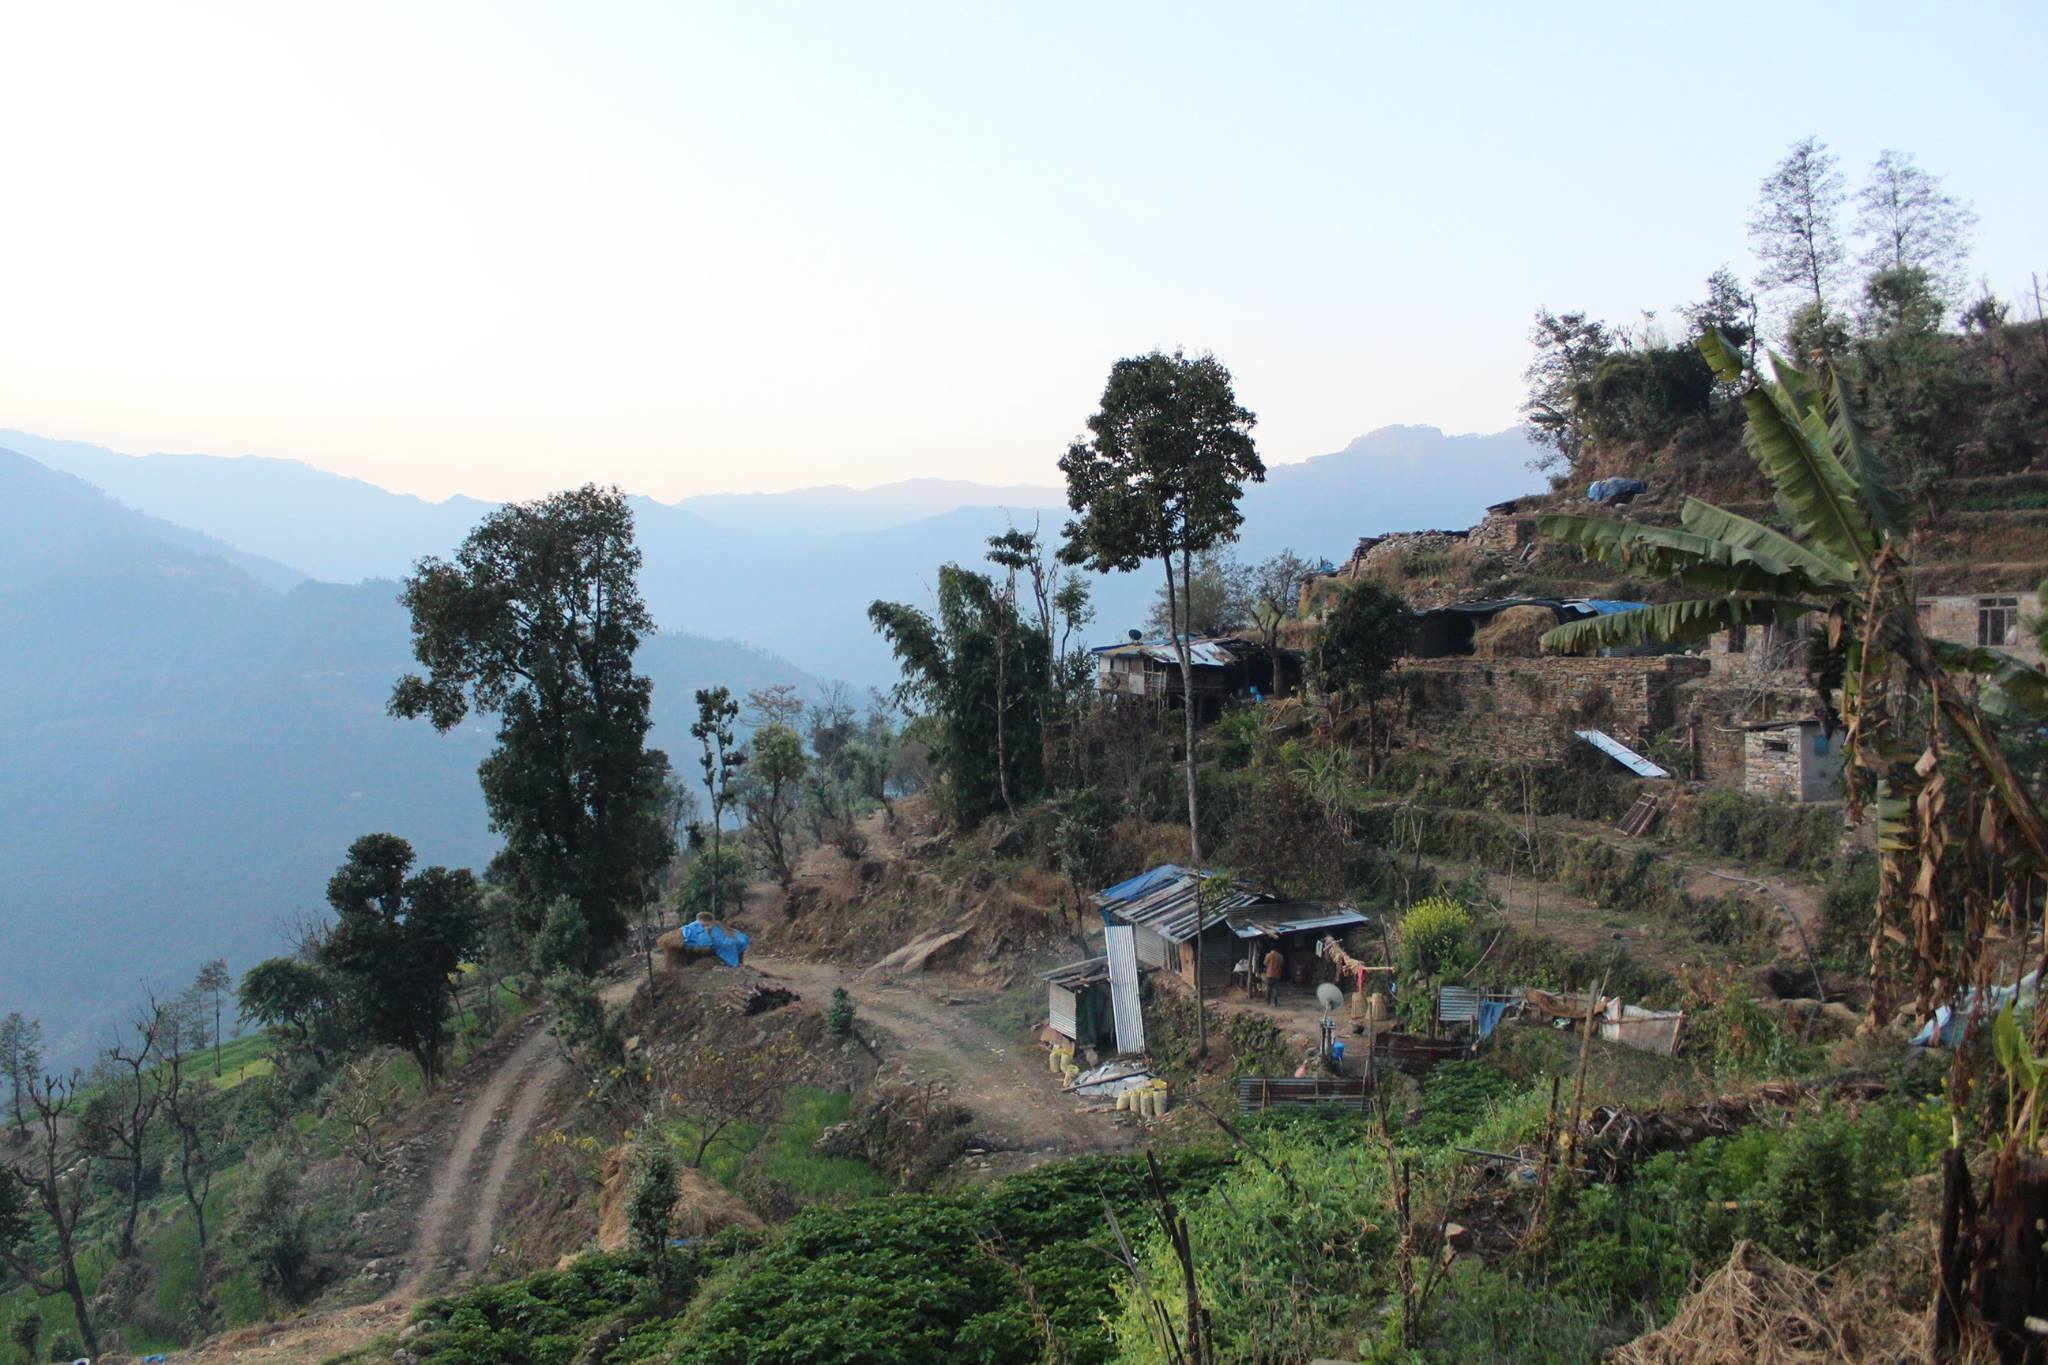 Morning mountain views